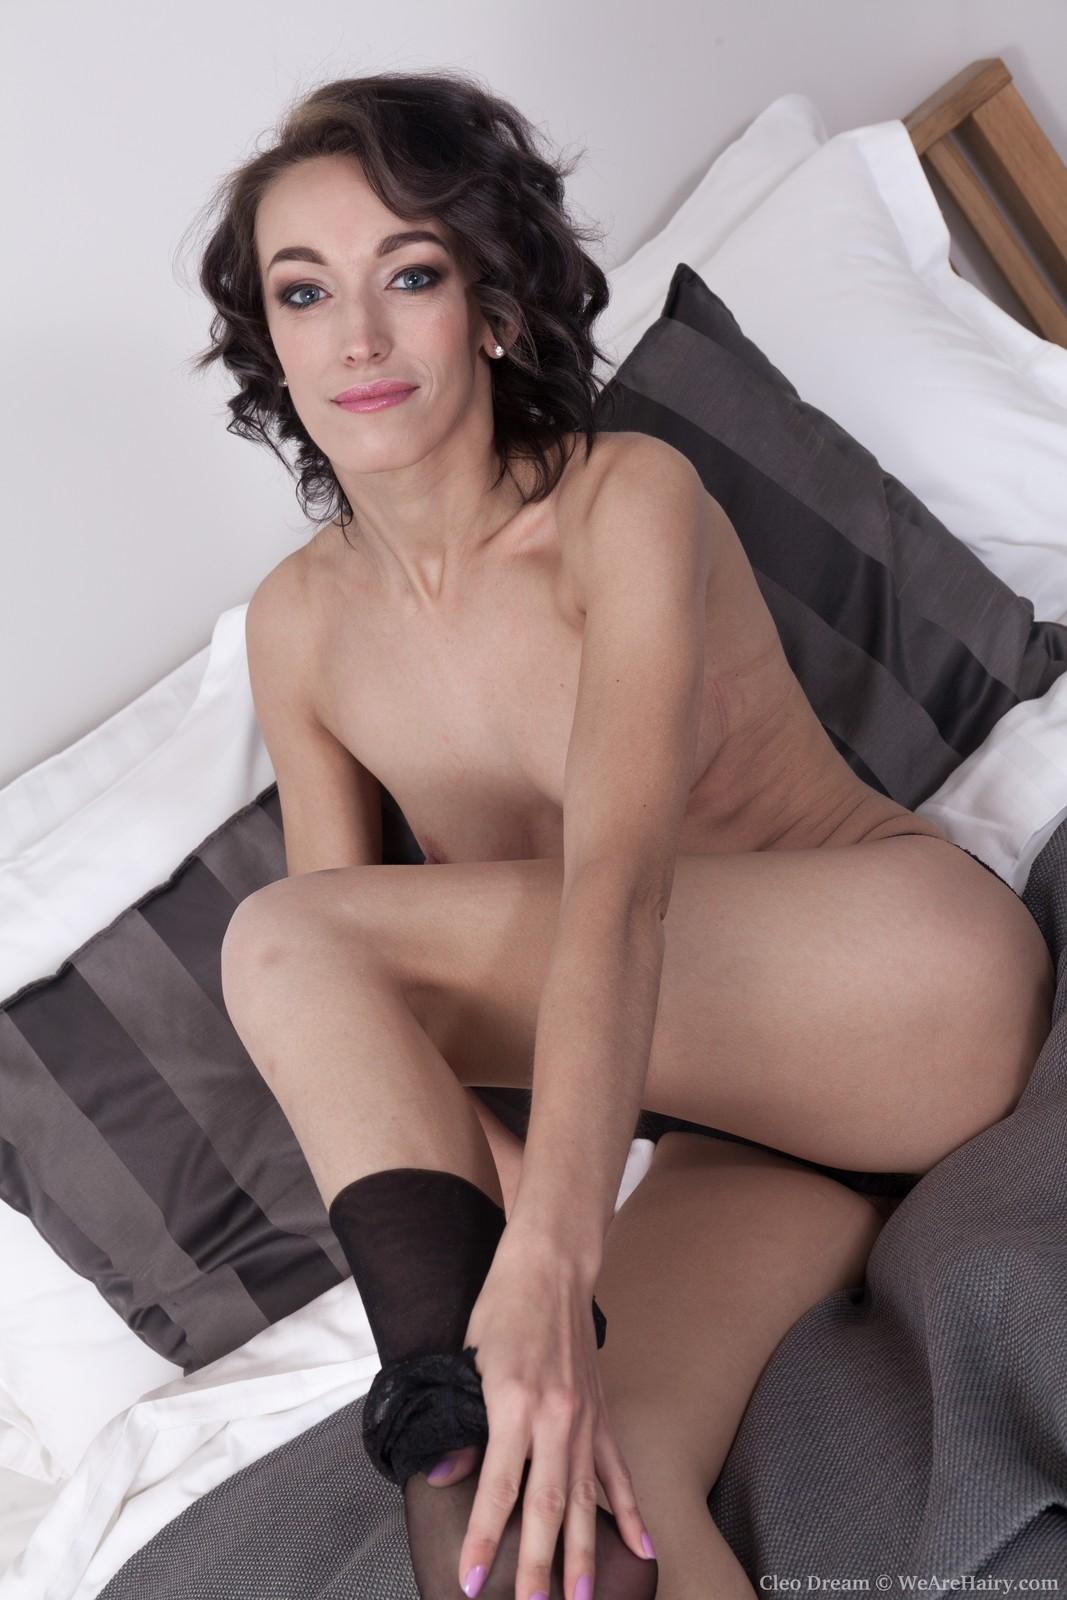 cleo-dream-slides-off-her-black-lingerie-in-bed5.jpg